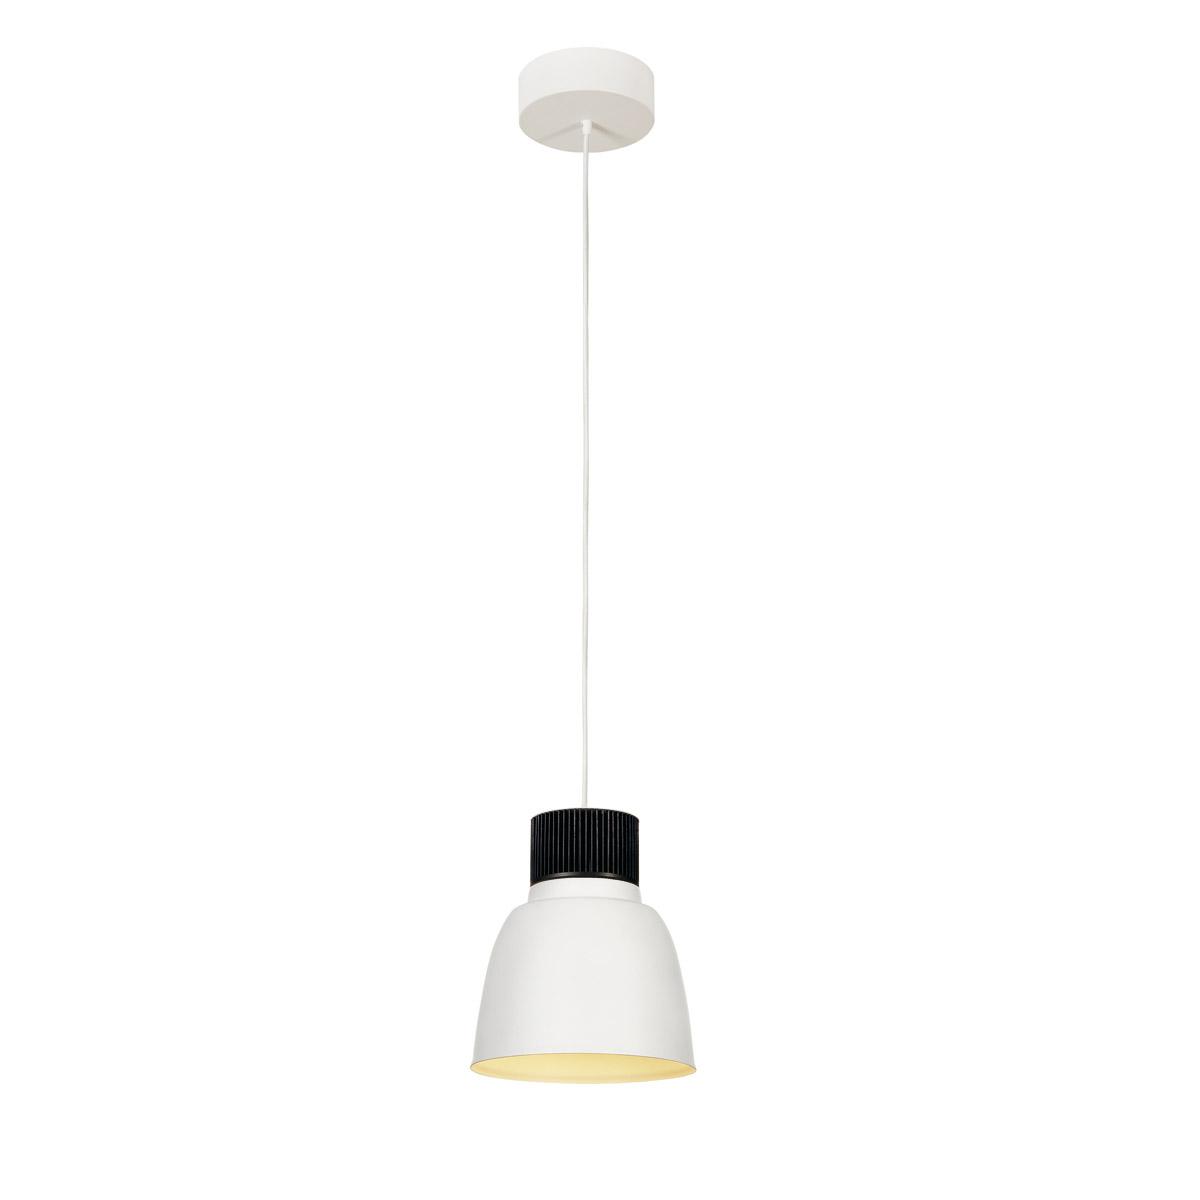 PENTULI LED pendulum luminaire 24, small, white